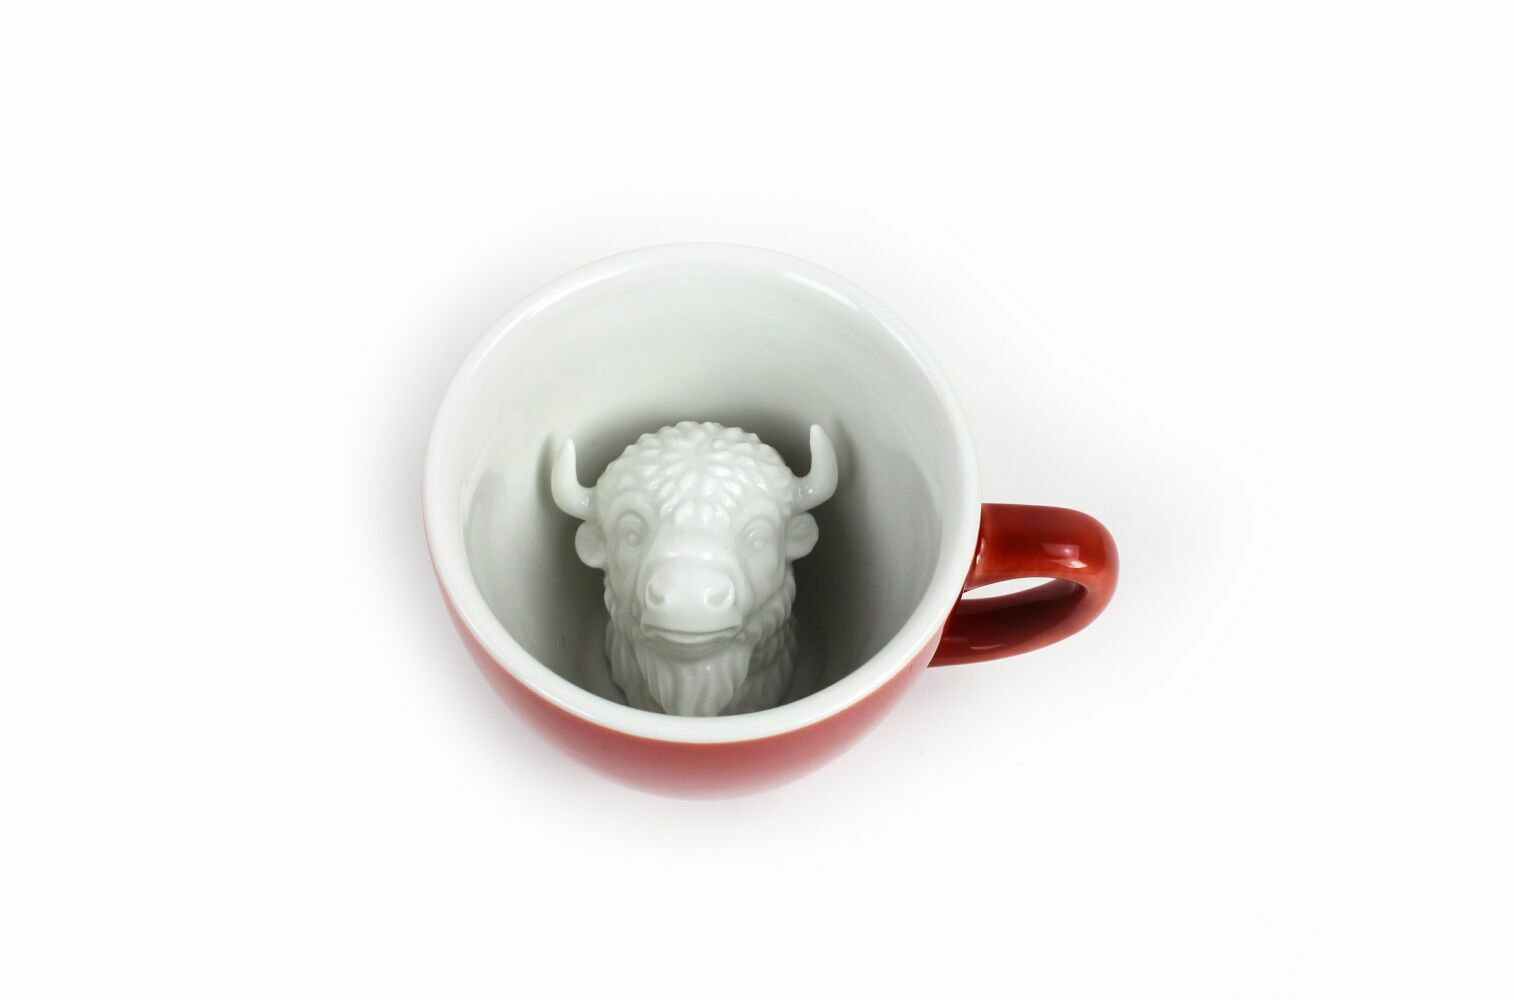 Пинкл (Pinkl) | Кружка с бизоном 330мл | Creature Cups Bison